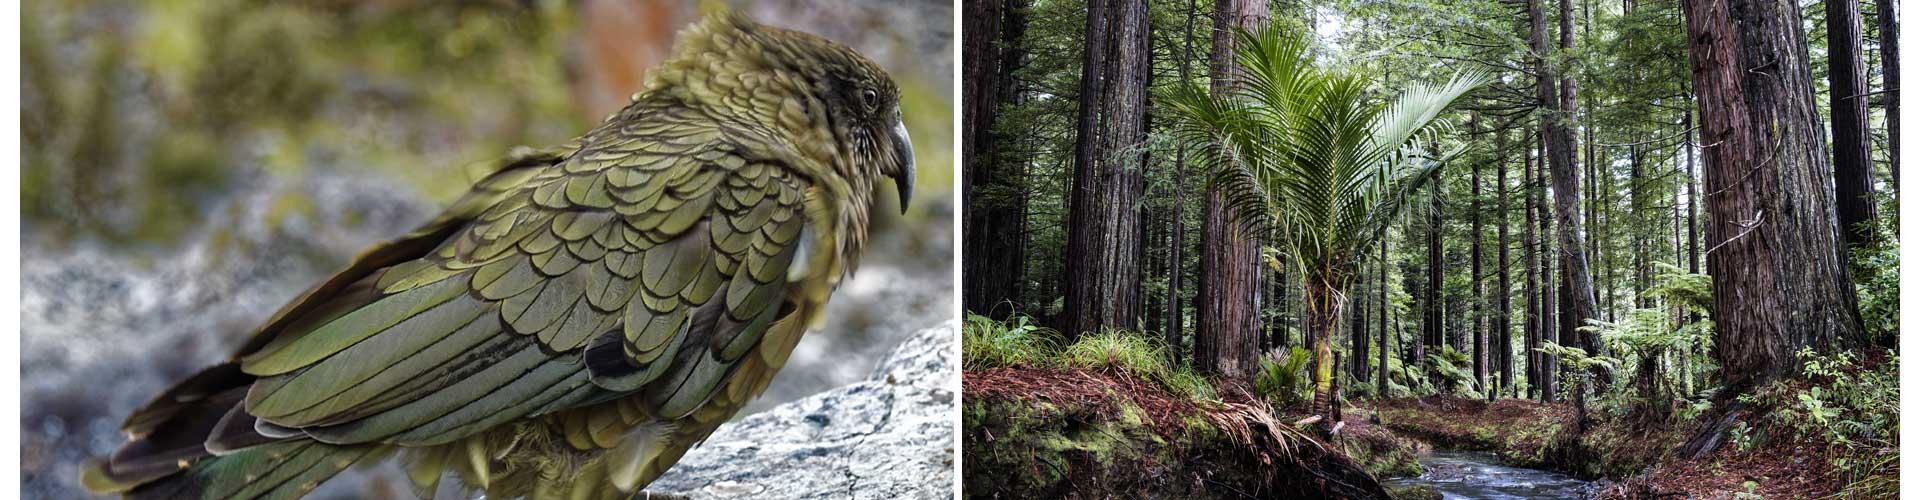 Neuseeland Reisetagebuch Ozeanien Redwood Kea Papagei Dschungel